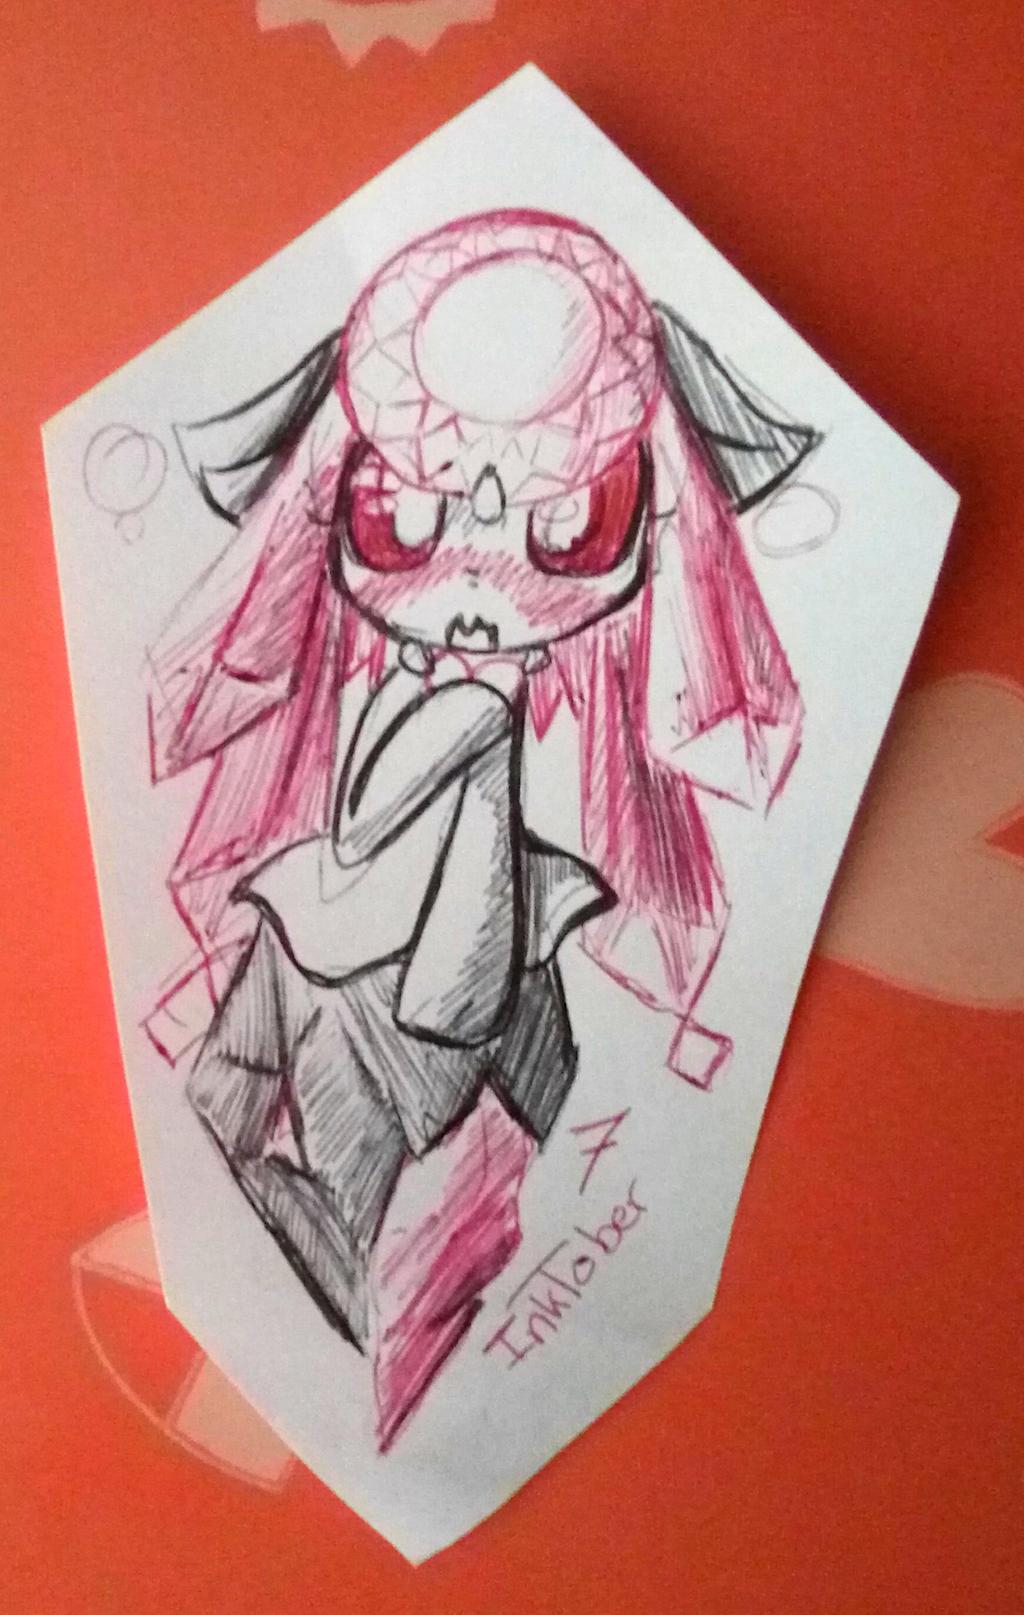 Galerie d'un p'tit chat! - Page 6 _inktober__7___diamond_princess_by_meyan_chama-dbptn6x